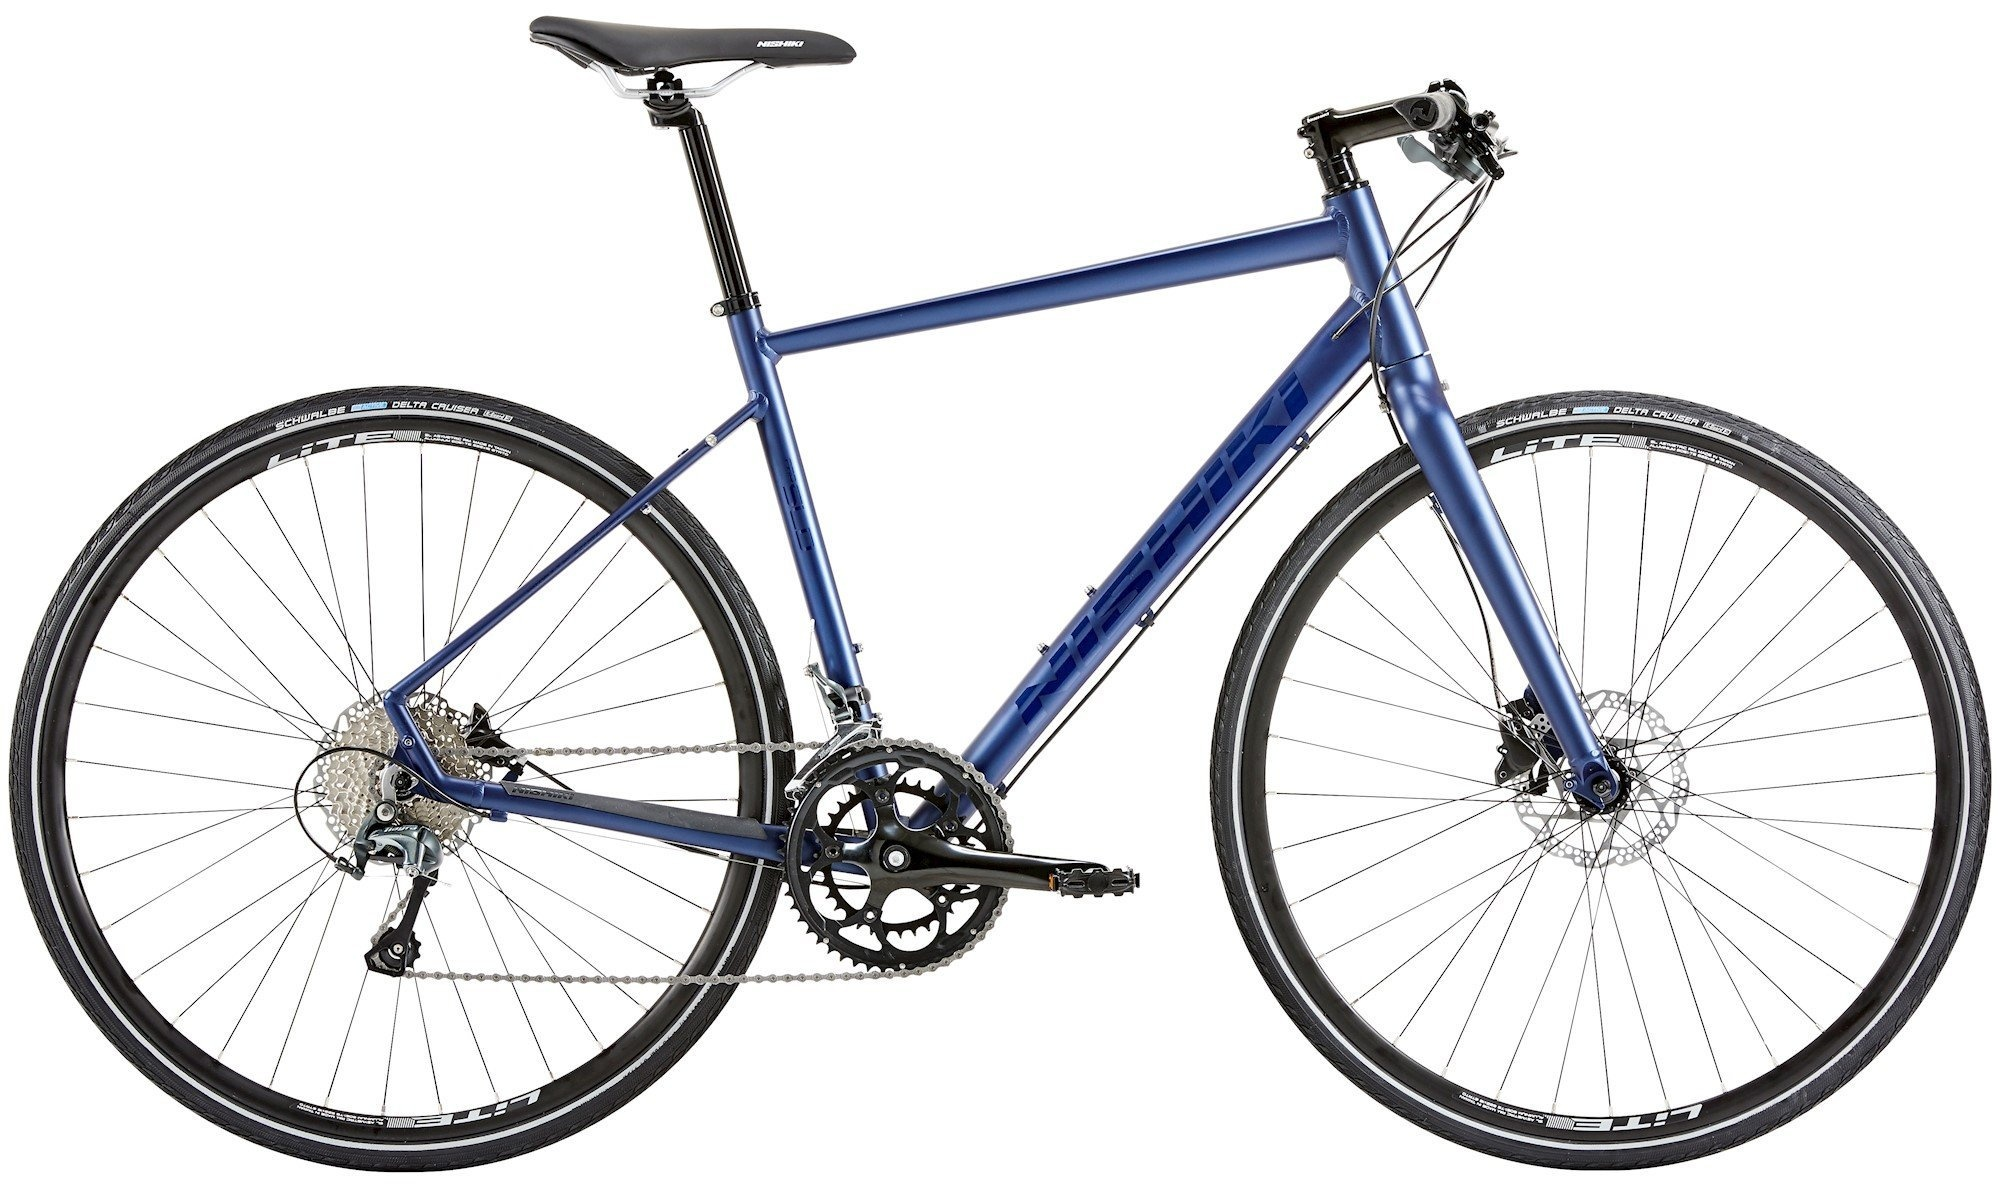 Nishiki Nishiki Pro Sld Herre 20G Skivebremse 2020 - Blå Cykler > Herrecykler